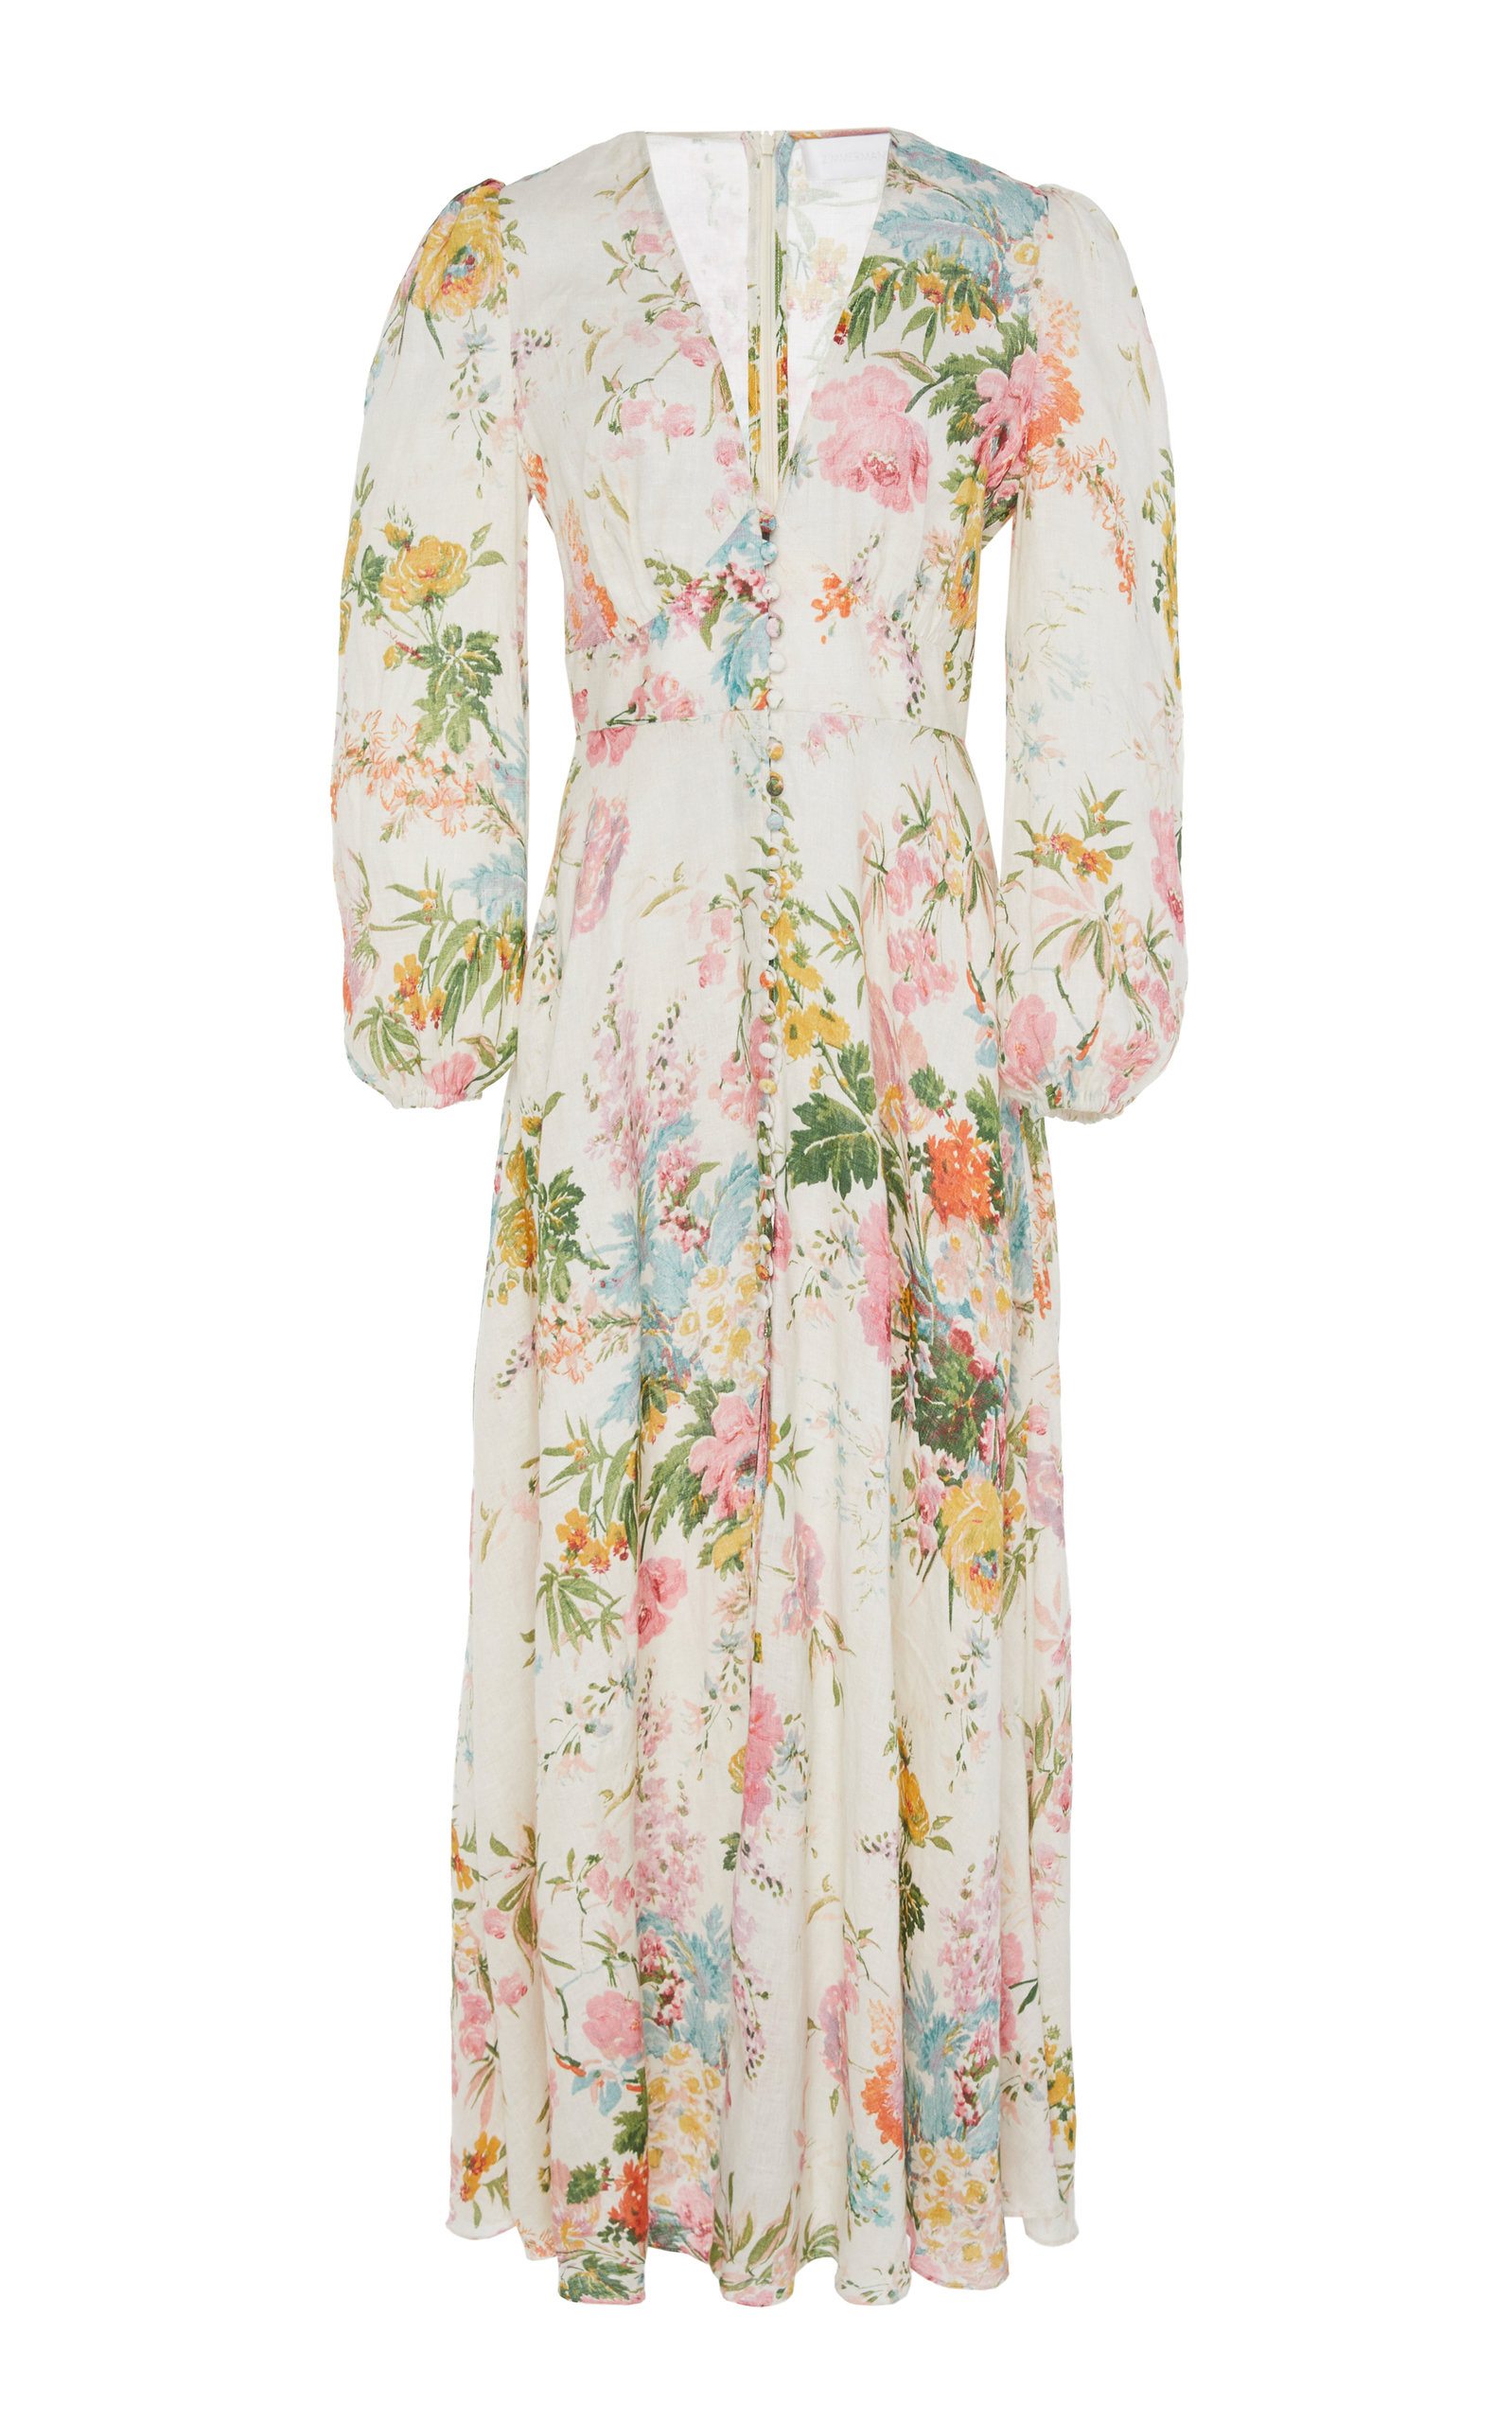 31c16ce8a2 ZimmermannHeathers Floral Linen Maxi Dress. CLOSE. Loading